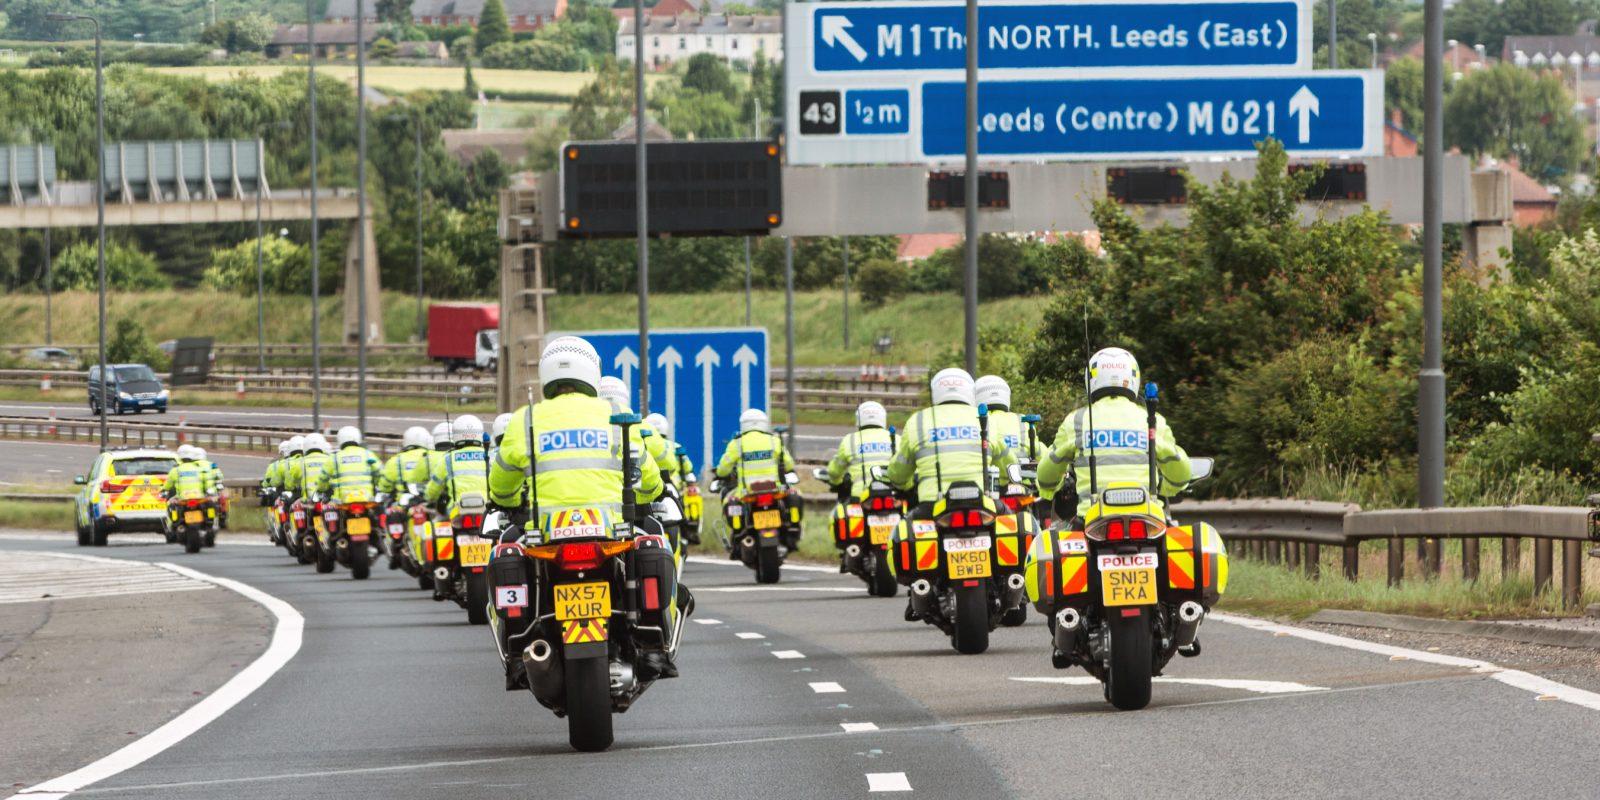 West Yorks Police